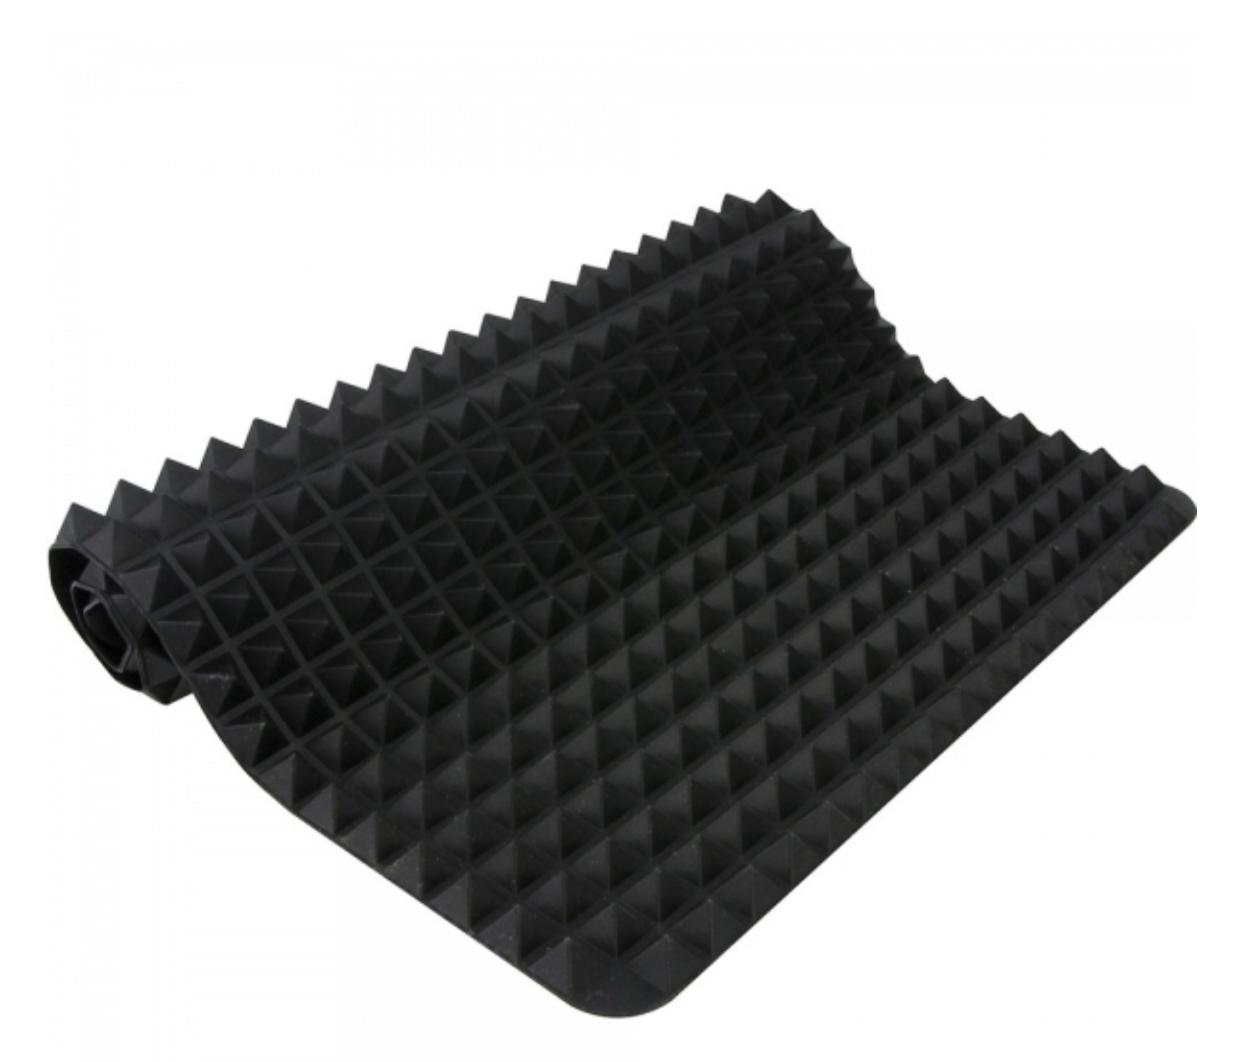 tapete culinário de silicone anti-aderente para forno 40 x 28 cm preto